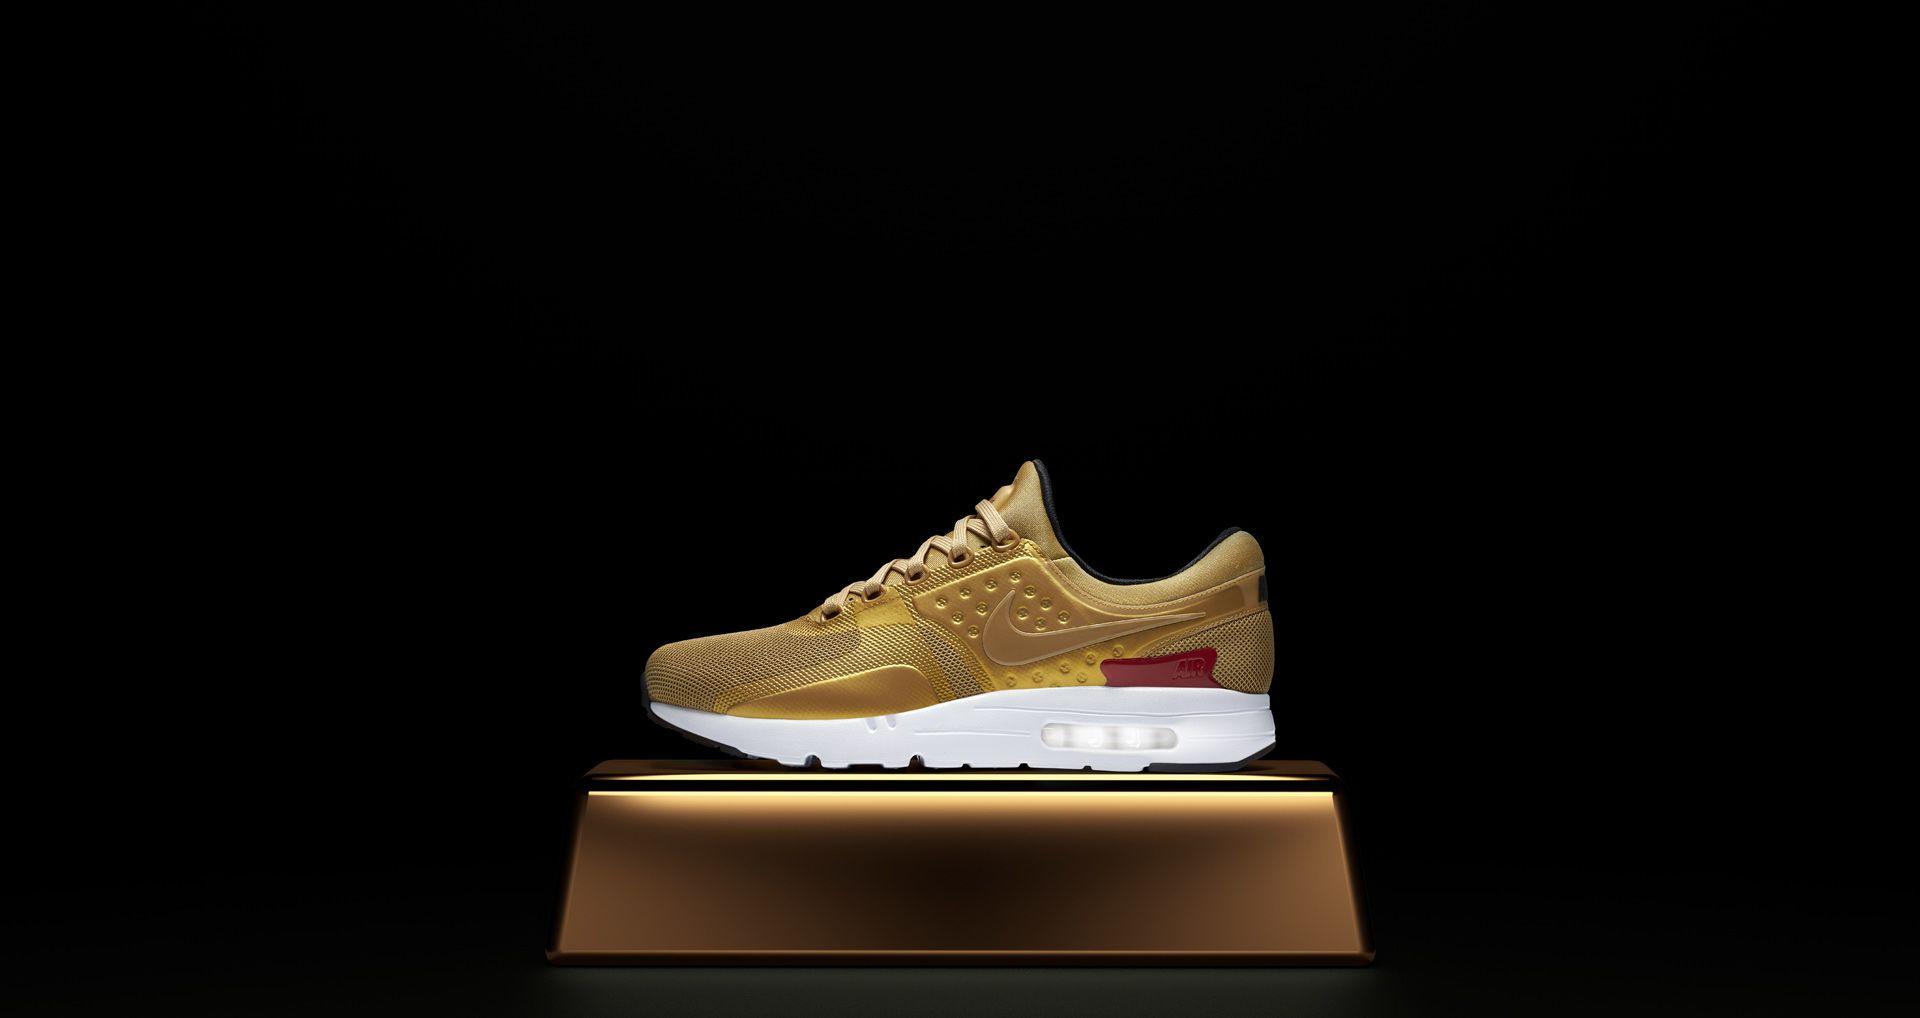 Nike Air Max Zero Tinker Hatfield